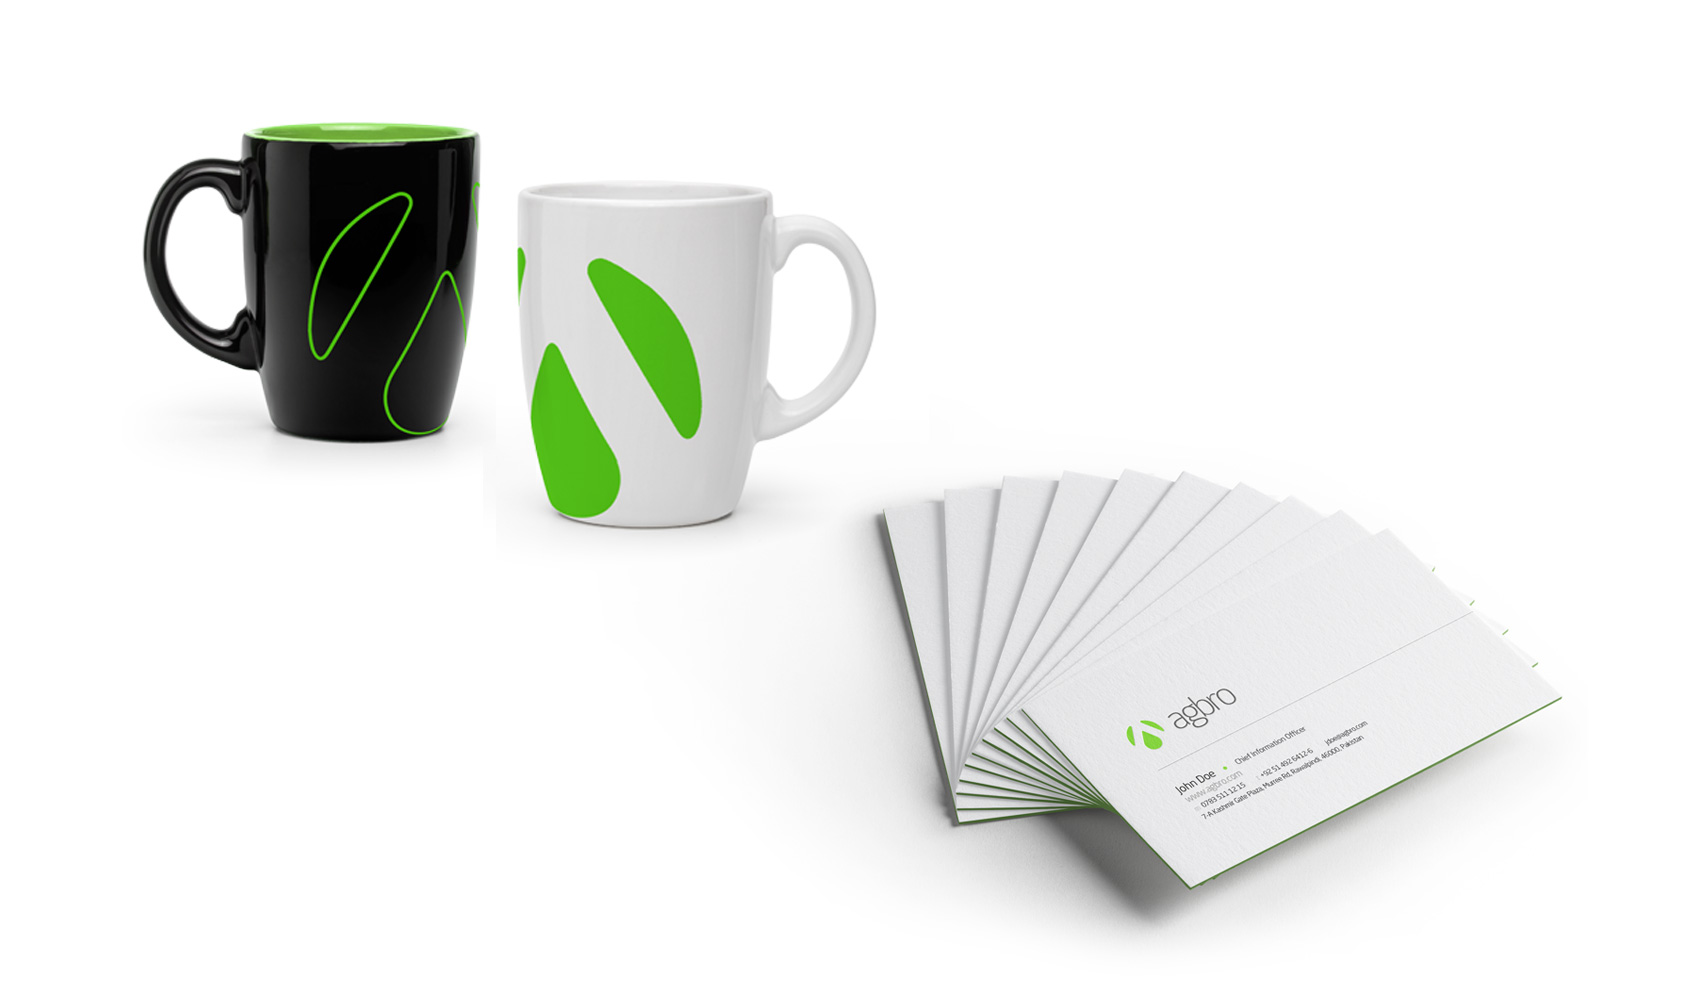 Agbro Group - Branding - Mugs and Business Cards